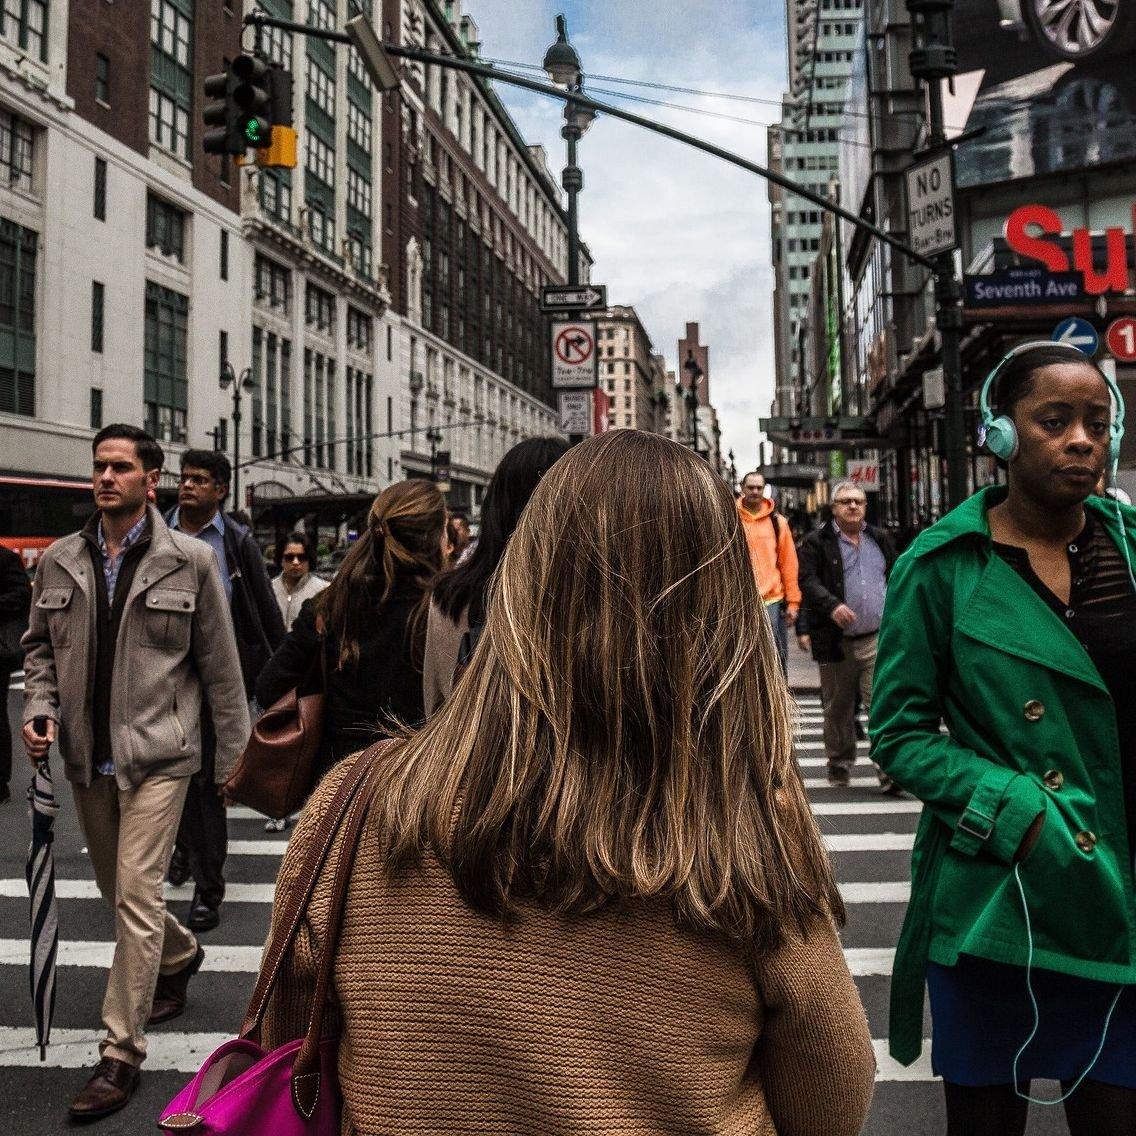 Woman Walking on Street Square